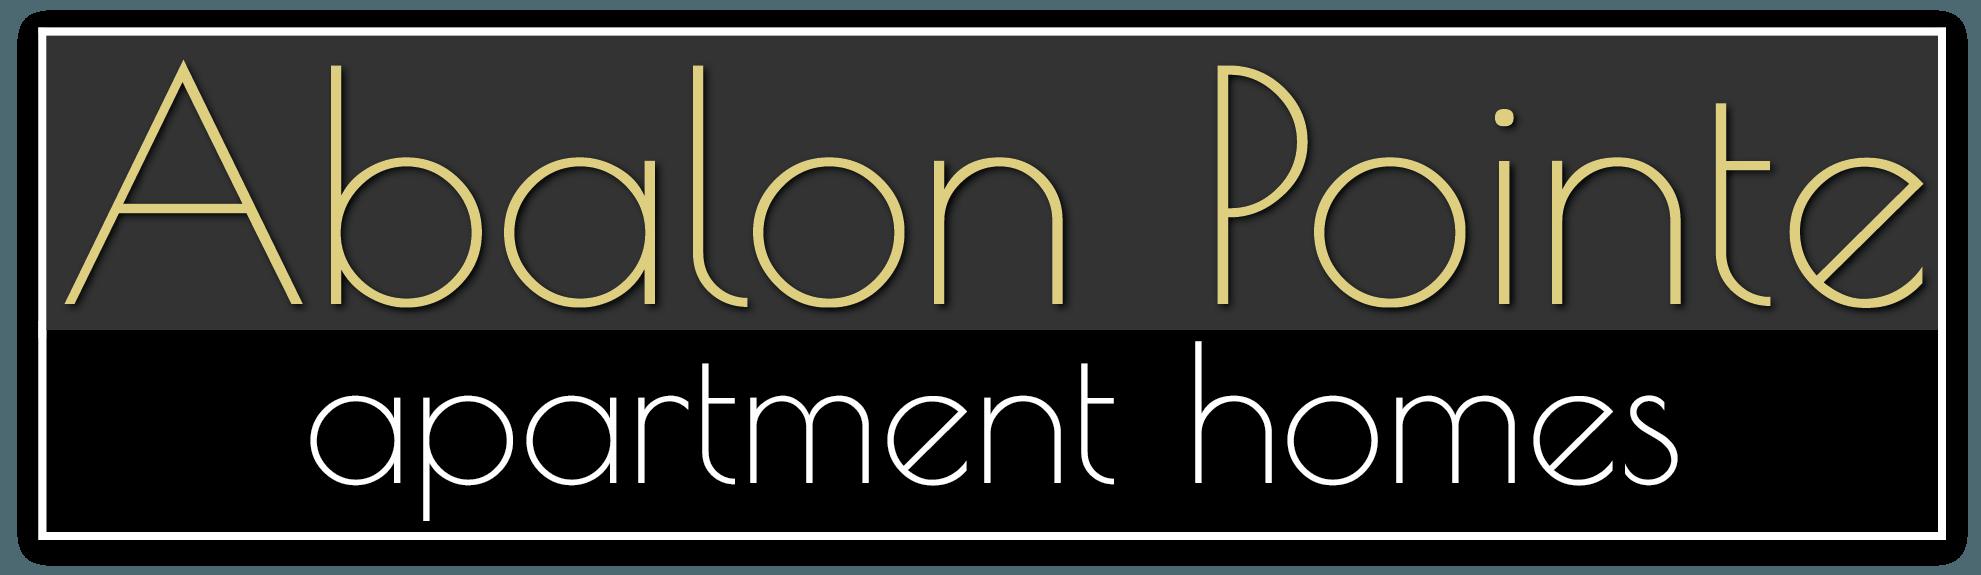 Abalon Pointe Apartments